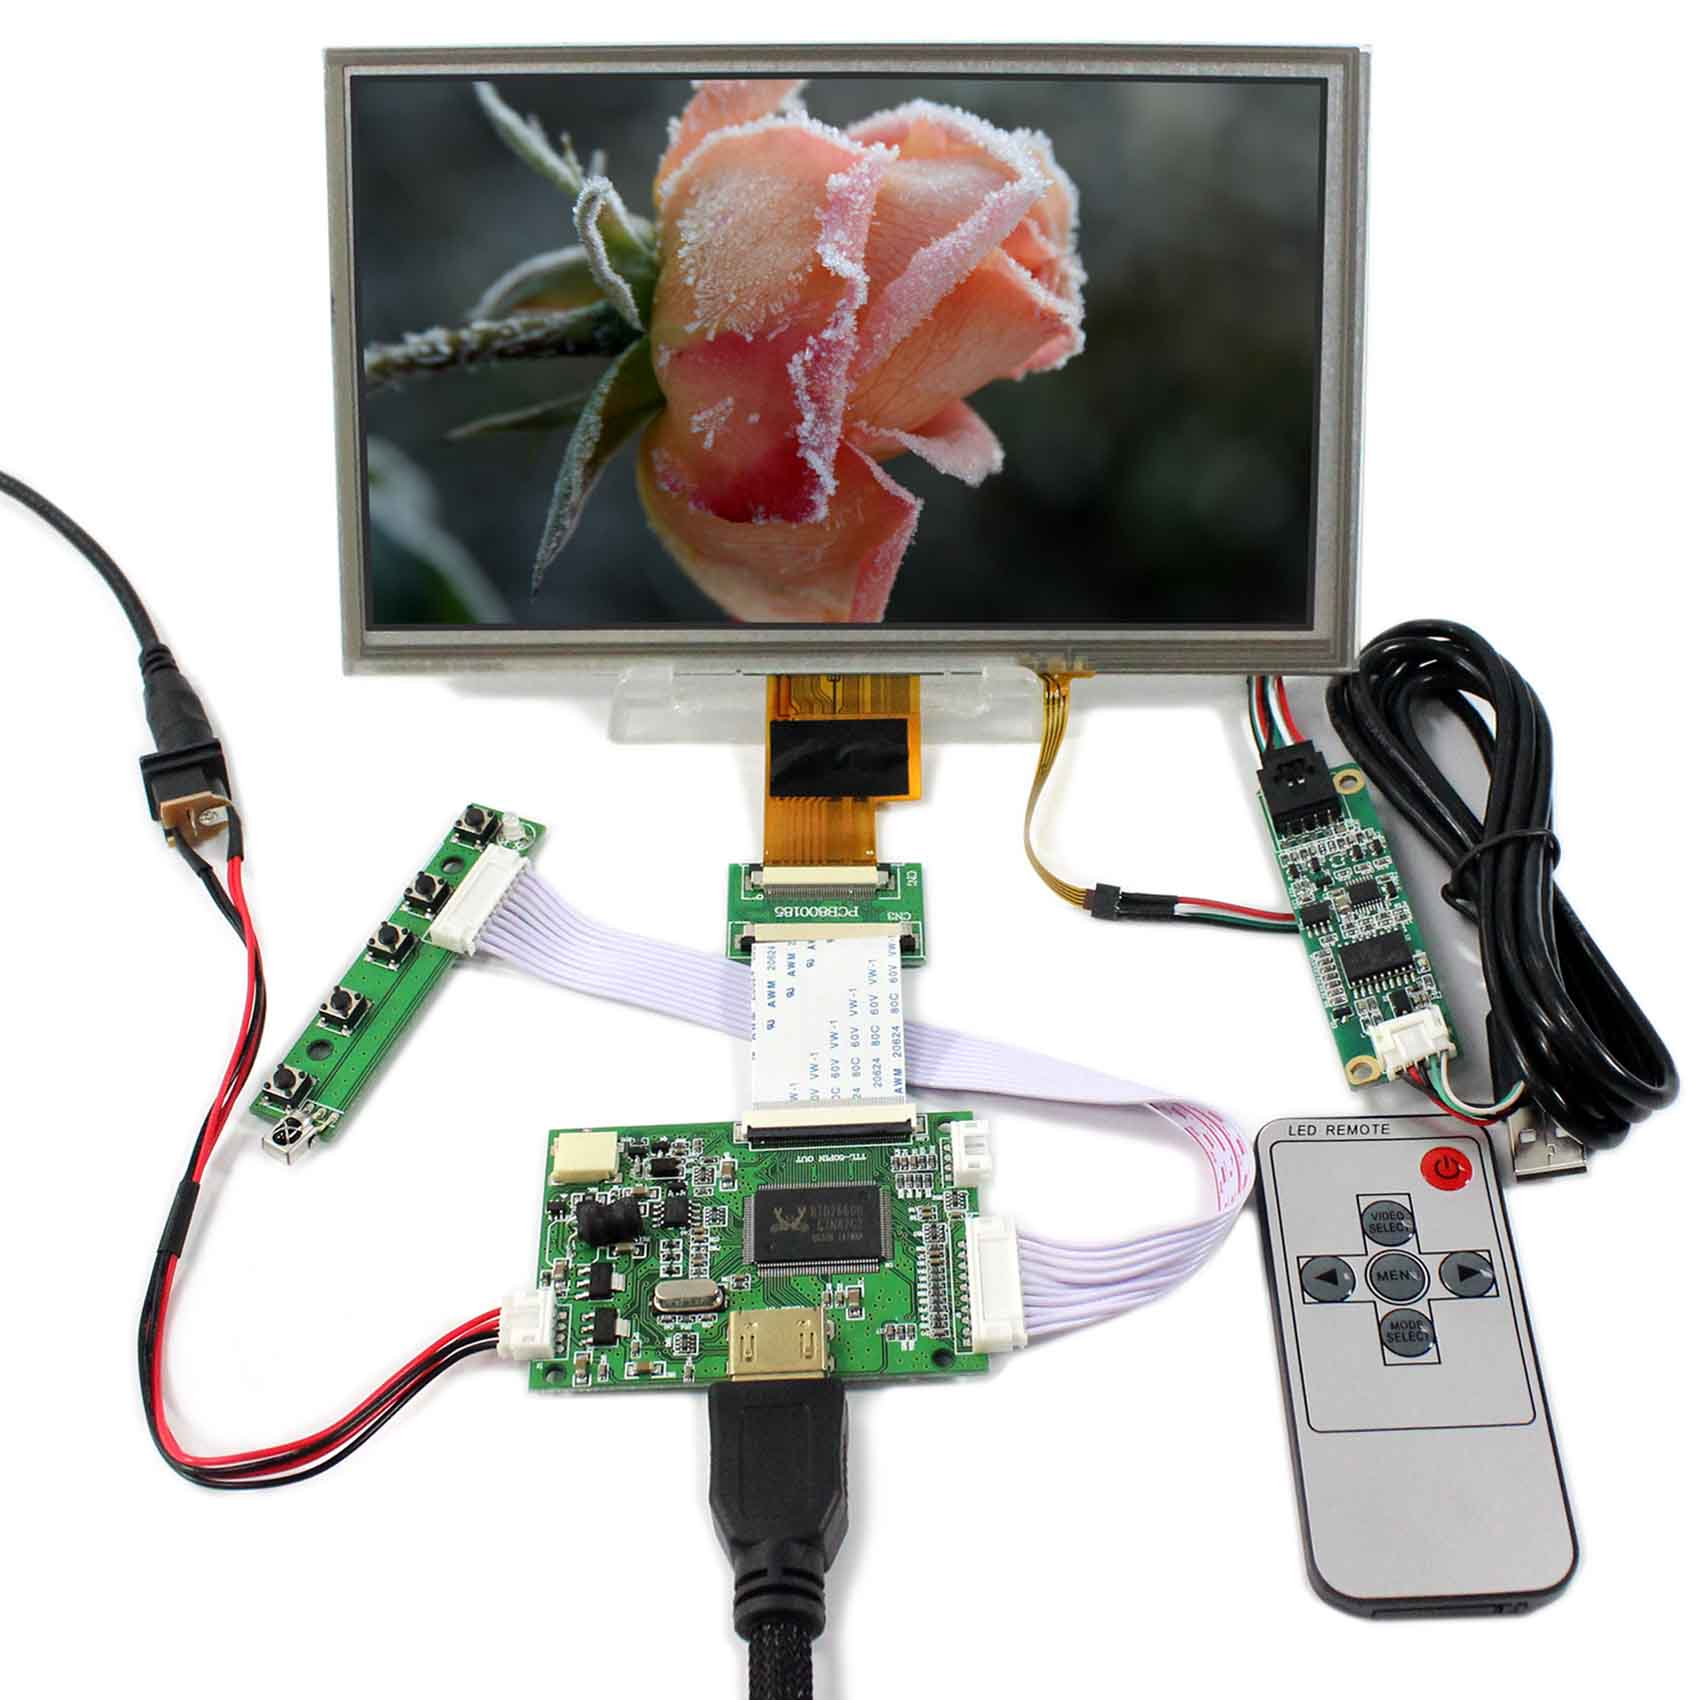 HDMI LCD Controller Board+8inch ZJ080NA-08A 1024X600 LCD Screen With Touch PanelHDMI LCD Controller Board+8inch ZJ080NA-08A 1024X600 LCD Screen With Touch Panel